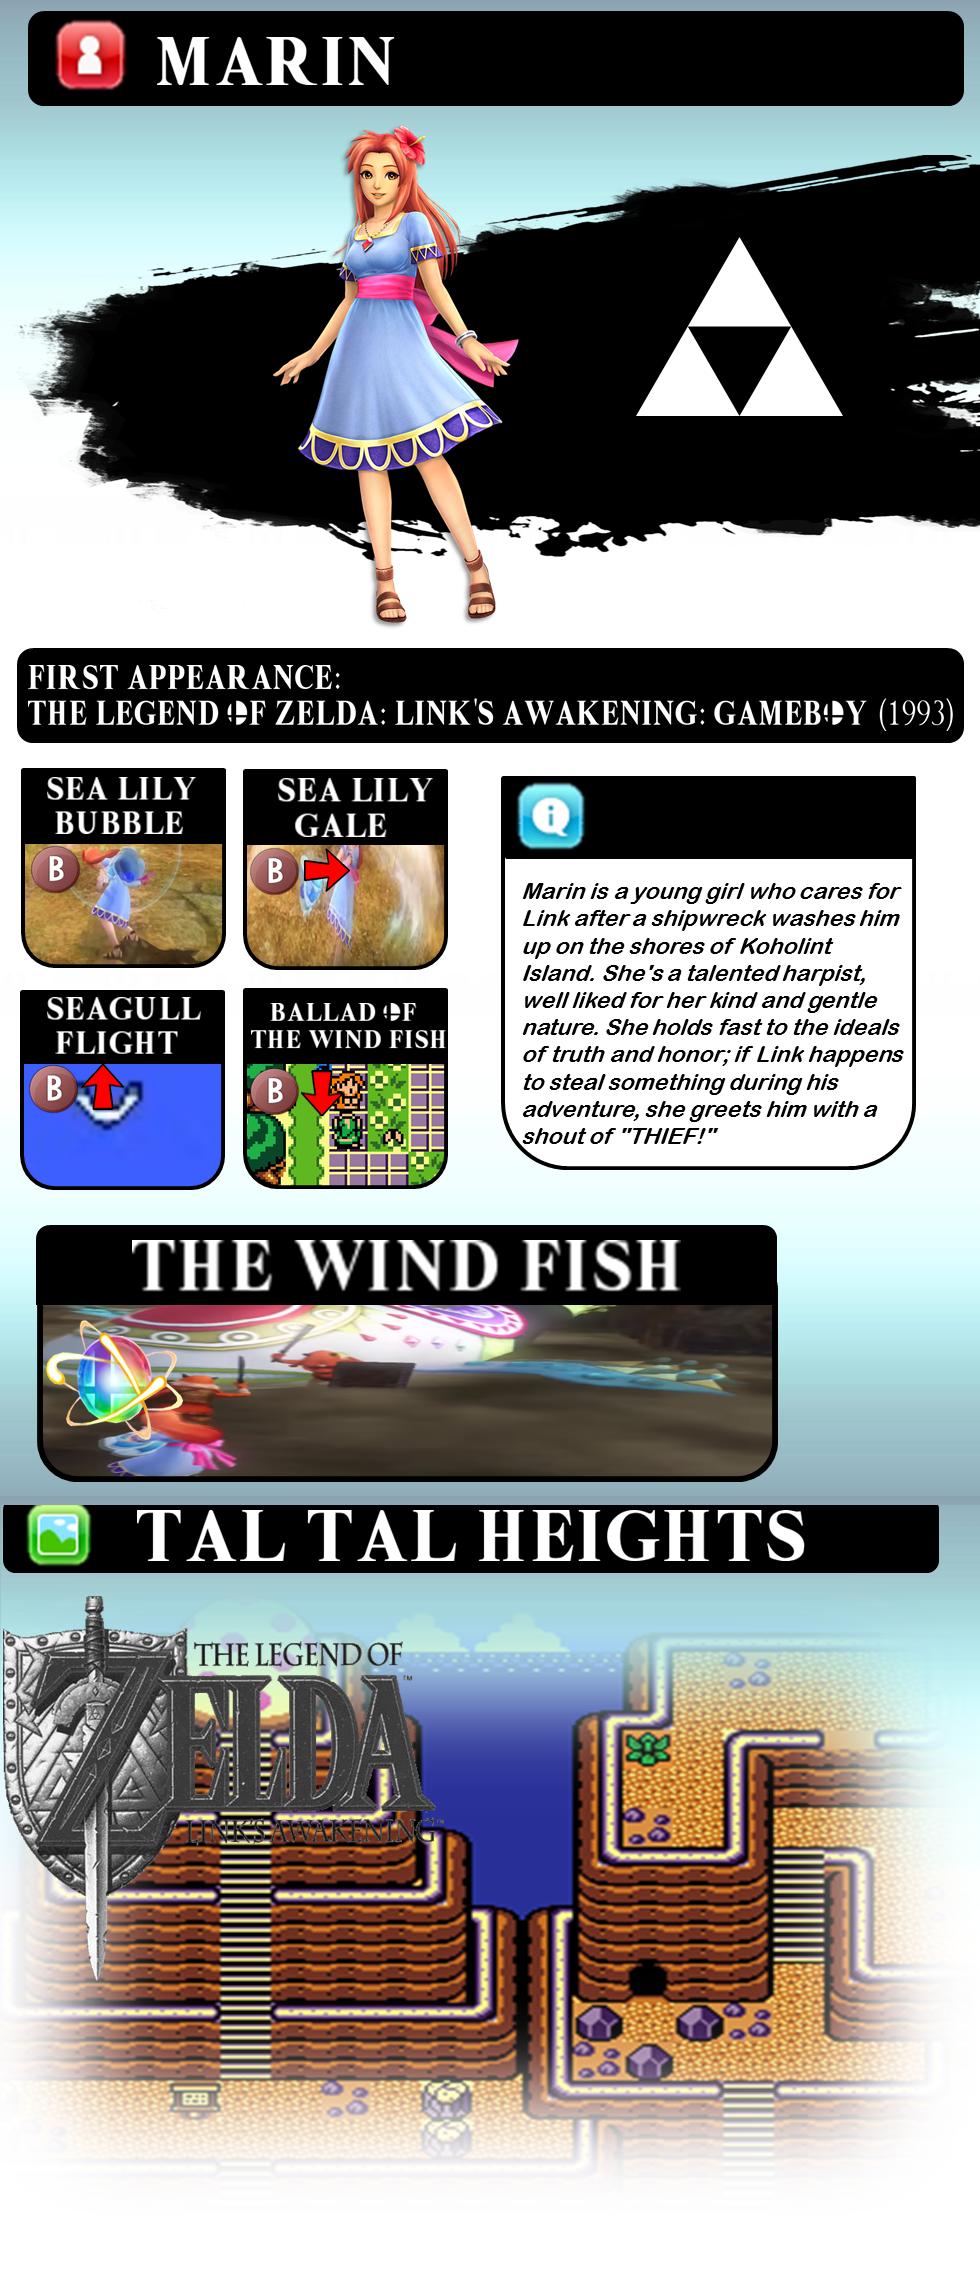 Super Smash Bros Move Set Ideas 002 Marin By Smash Thetic